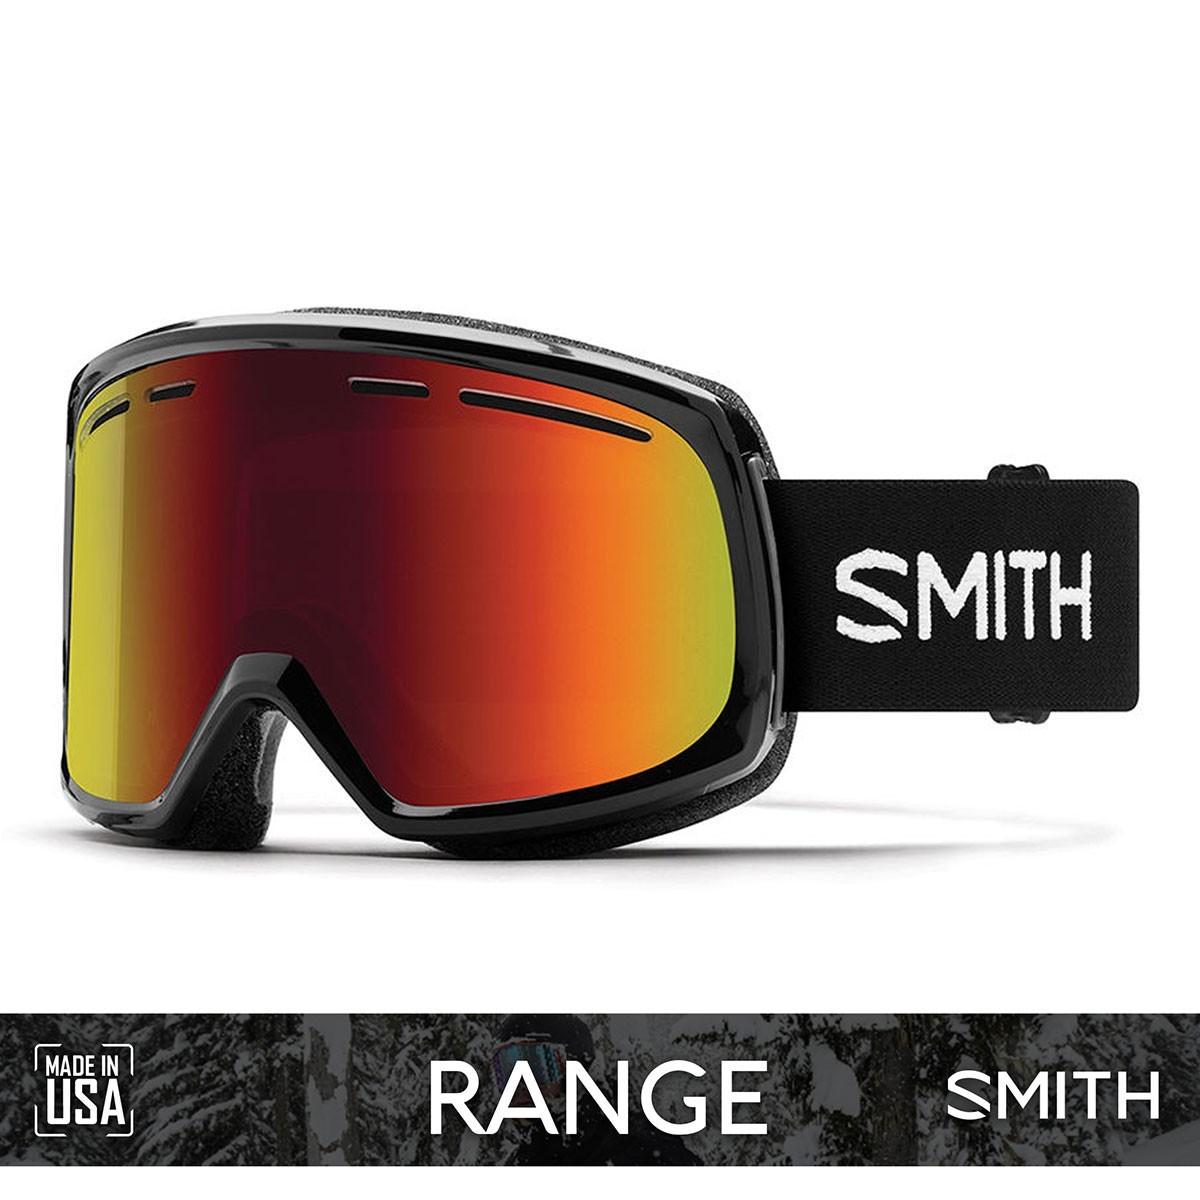 SMITH RANGE Black   S3 RED SOL-X Mirror - Изображение - AQUAMATRIX